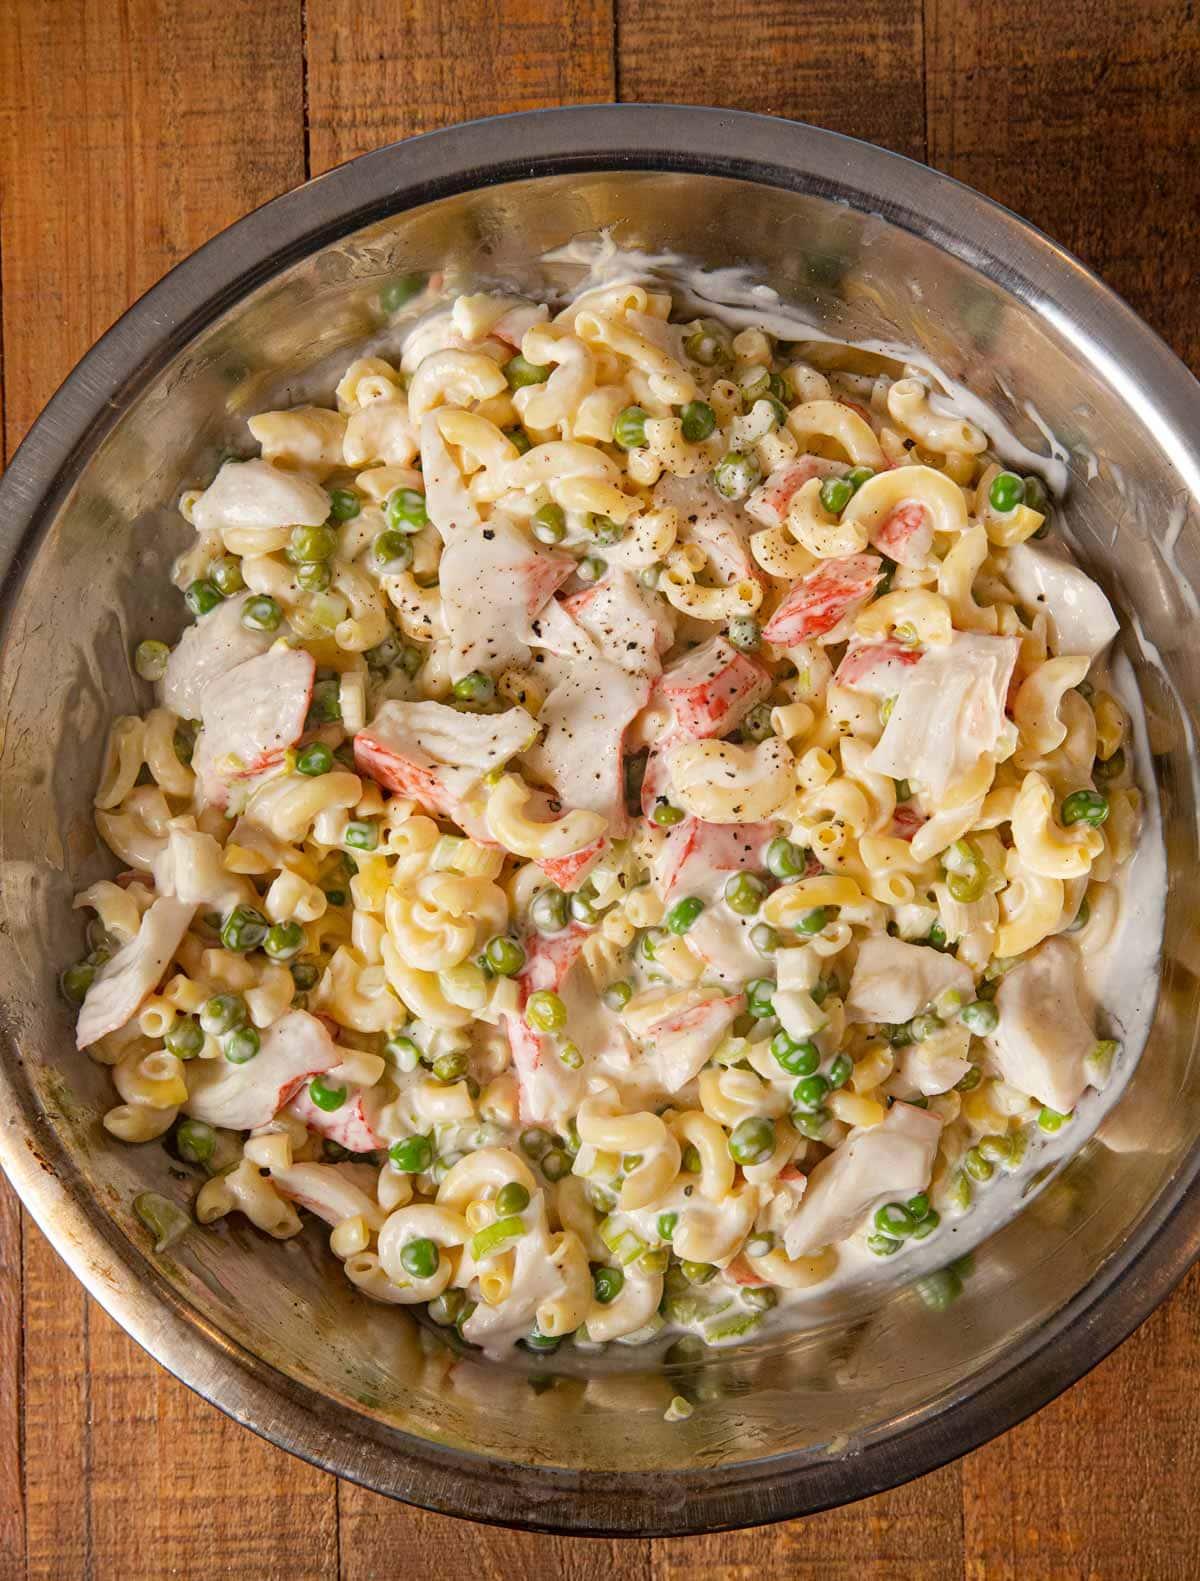 Seafood Pasta Salad in mixing bowl